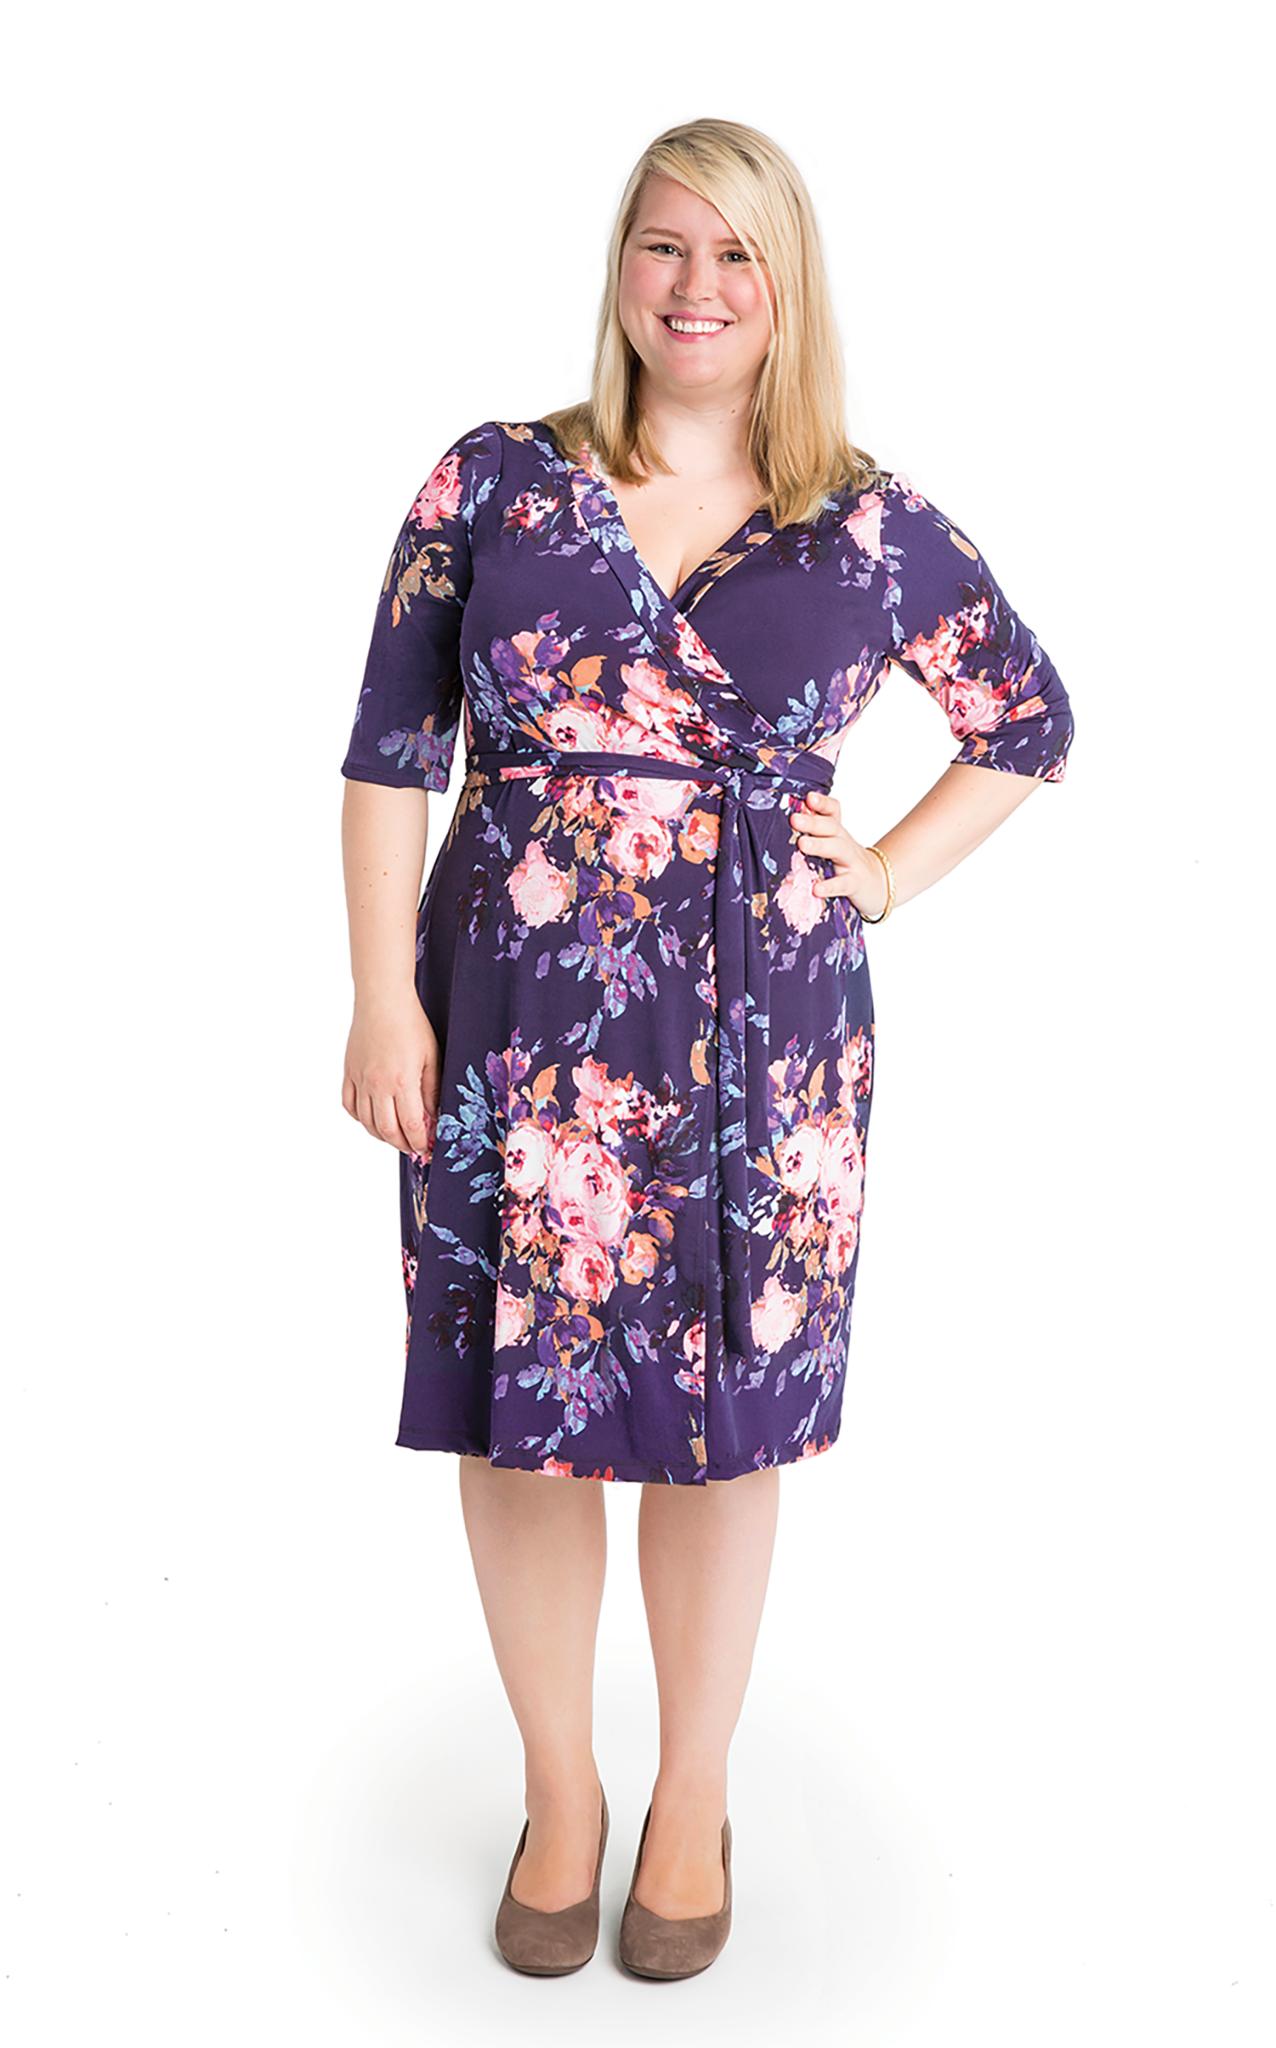 Jenny in the new Cashmerette Patterns Appleton Dress (sizes 18